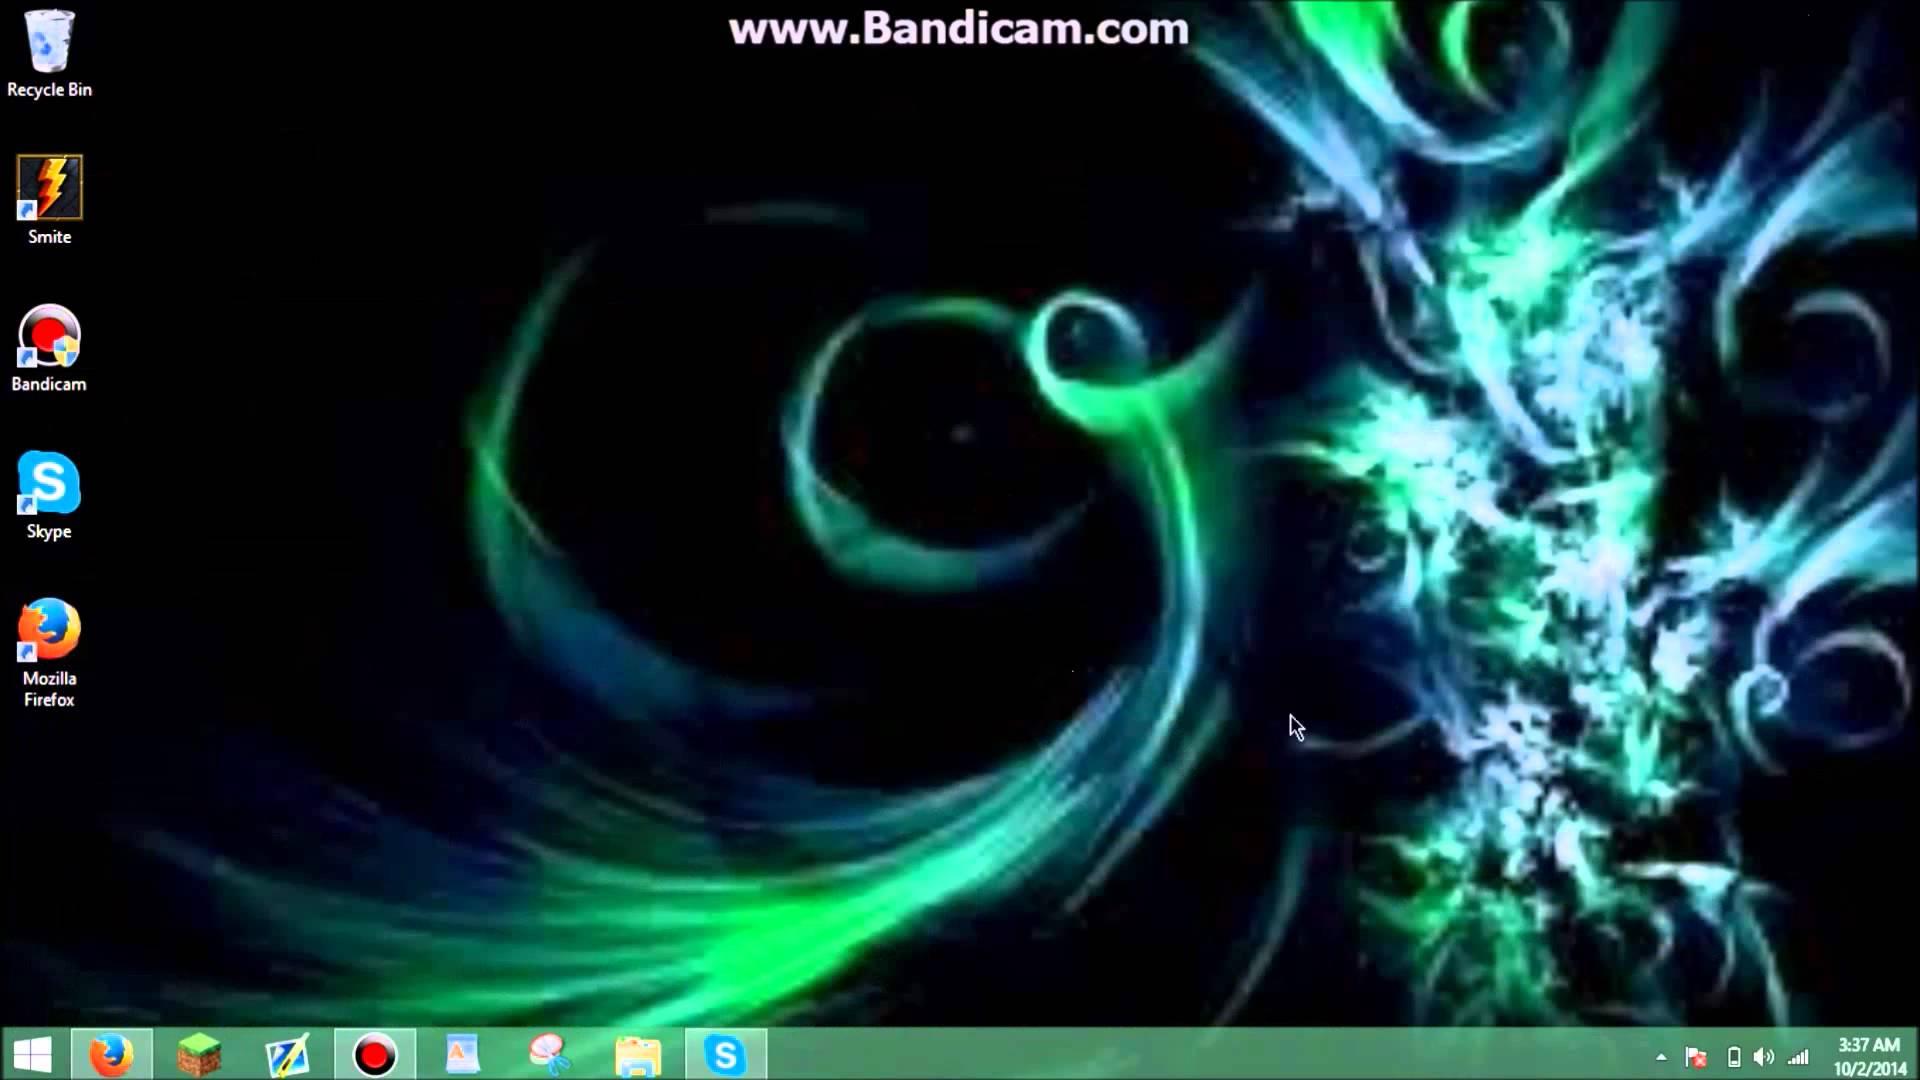 Desktop Background Looks Blurry